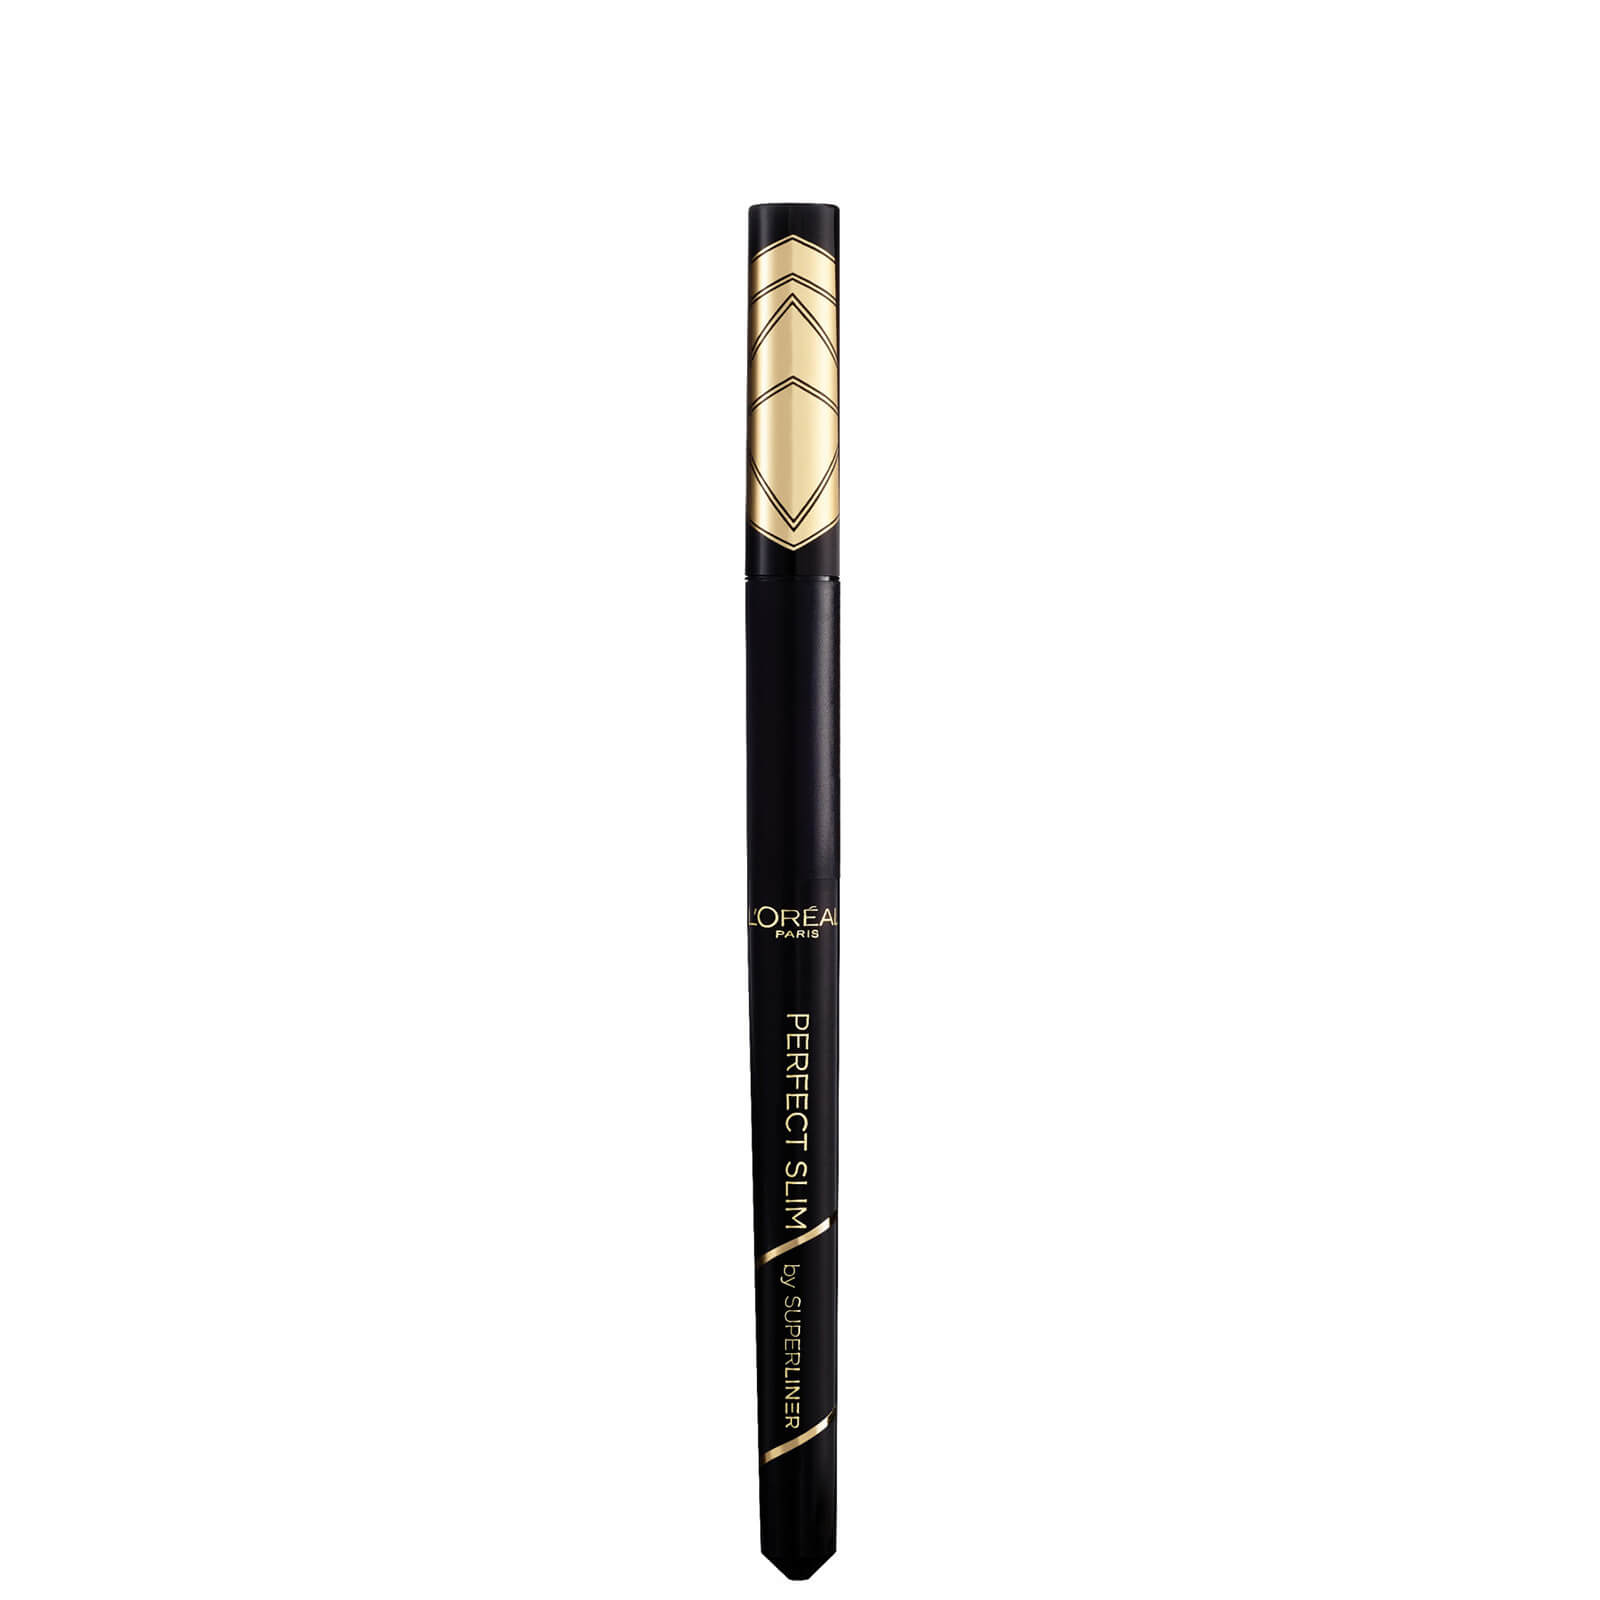 L'Oreal Paris Superliner Perfect Slim Liquid Smudge-Proof Eyeliner 8g (Various Shades) - 01 Intense Black